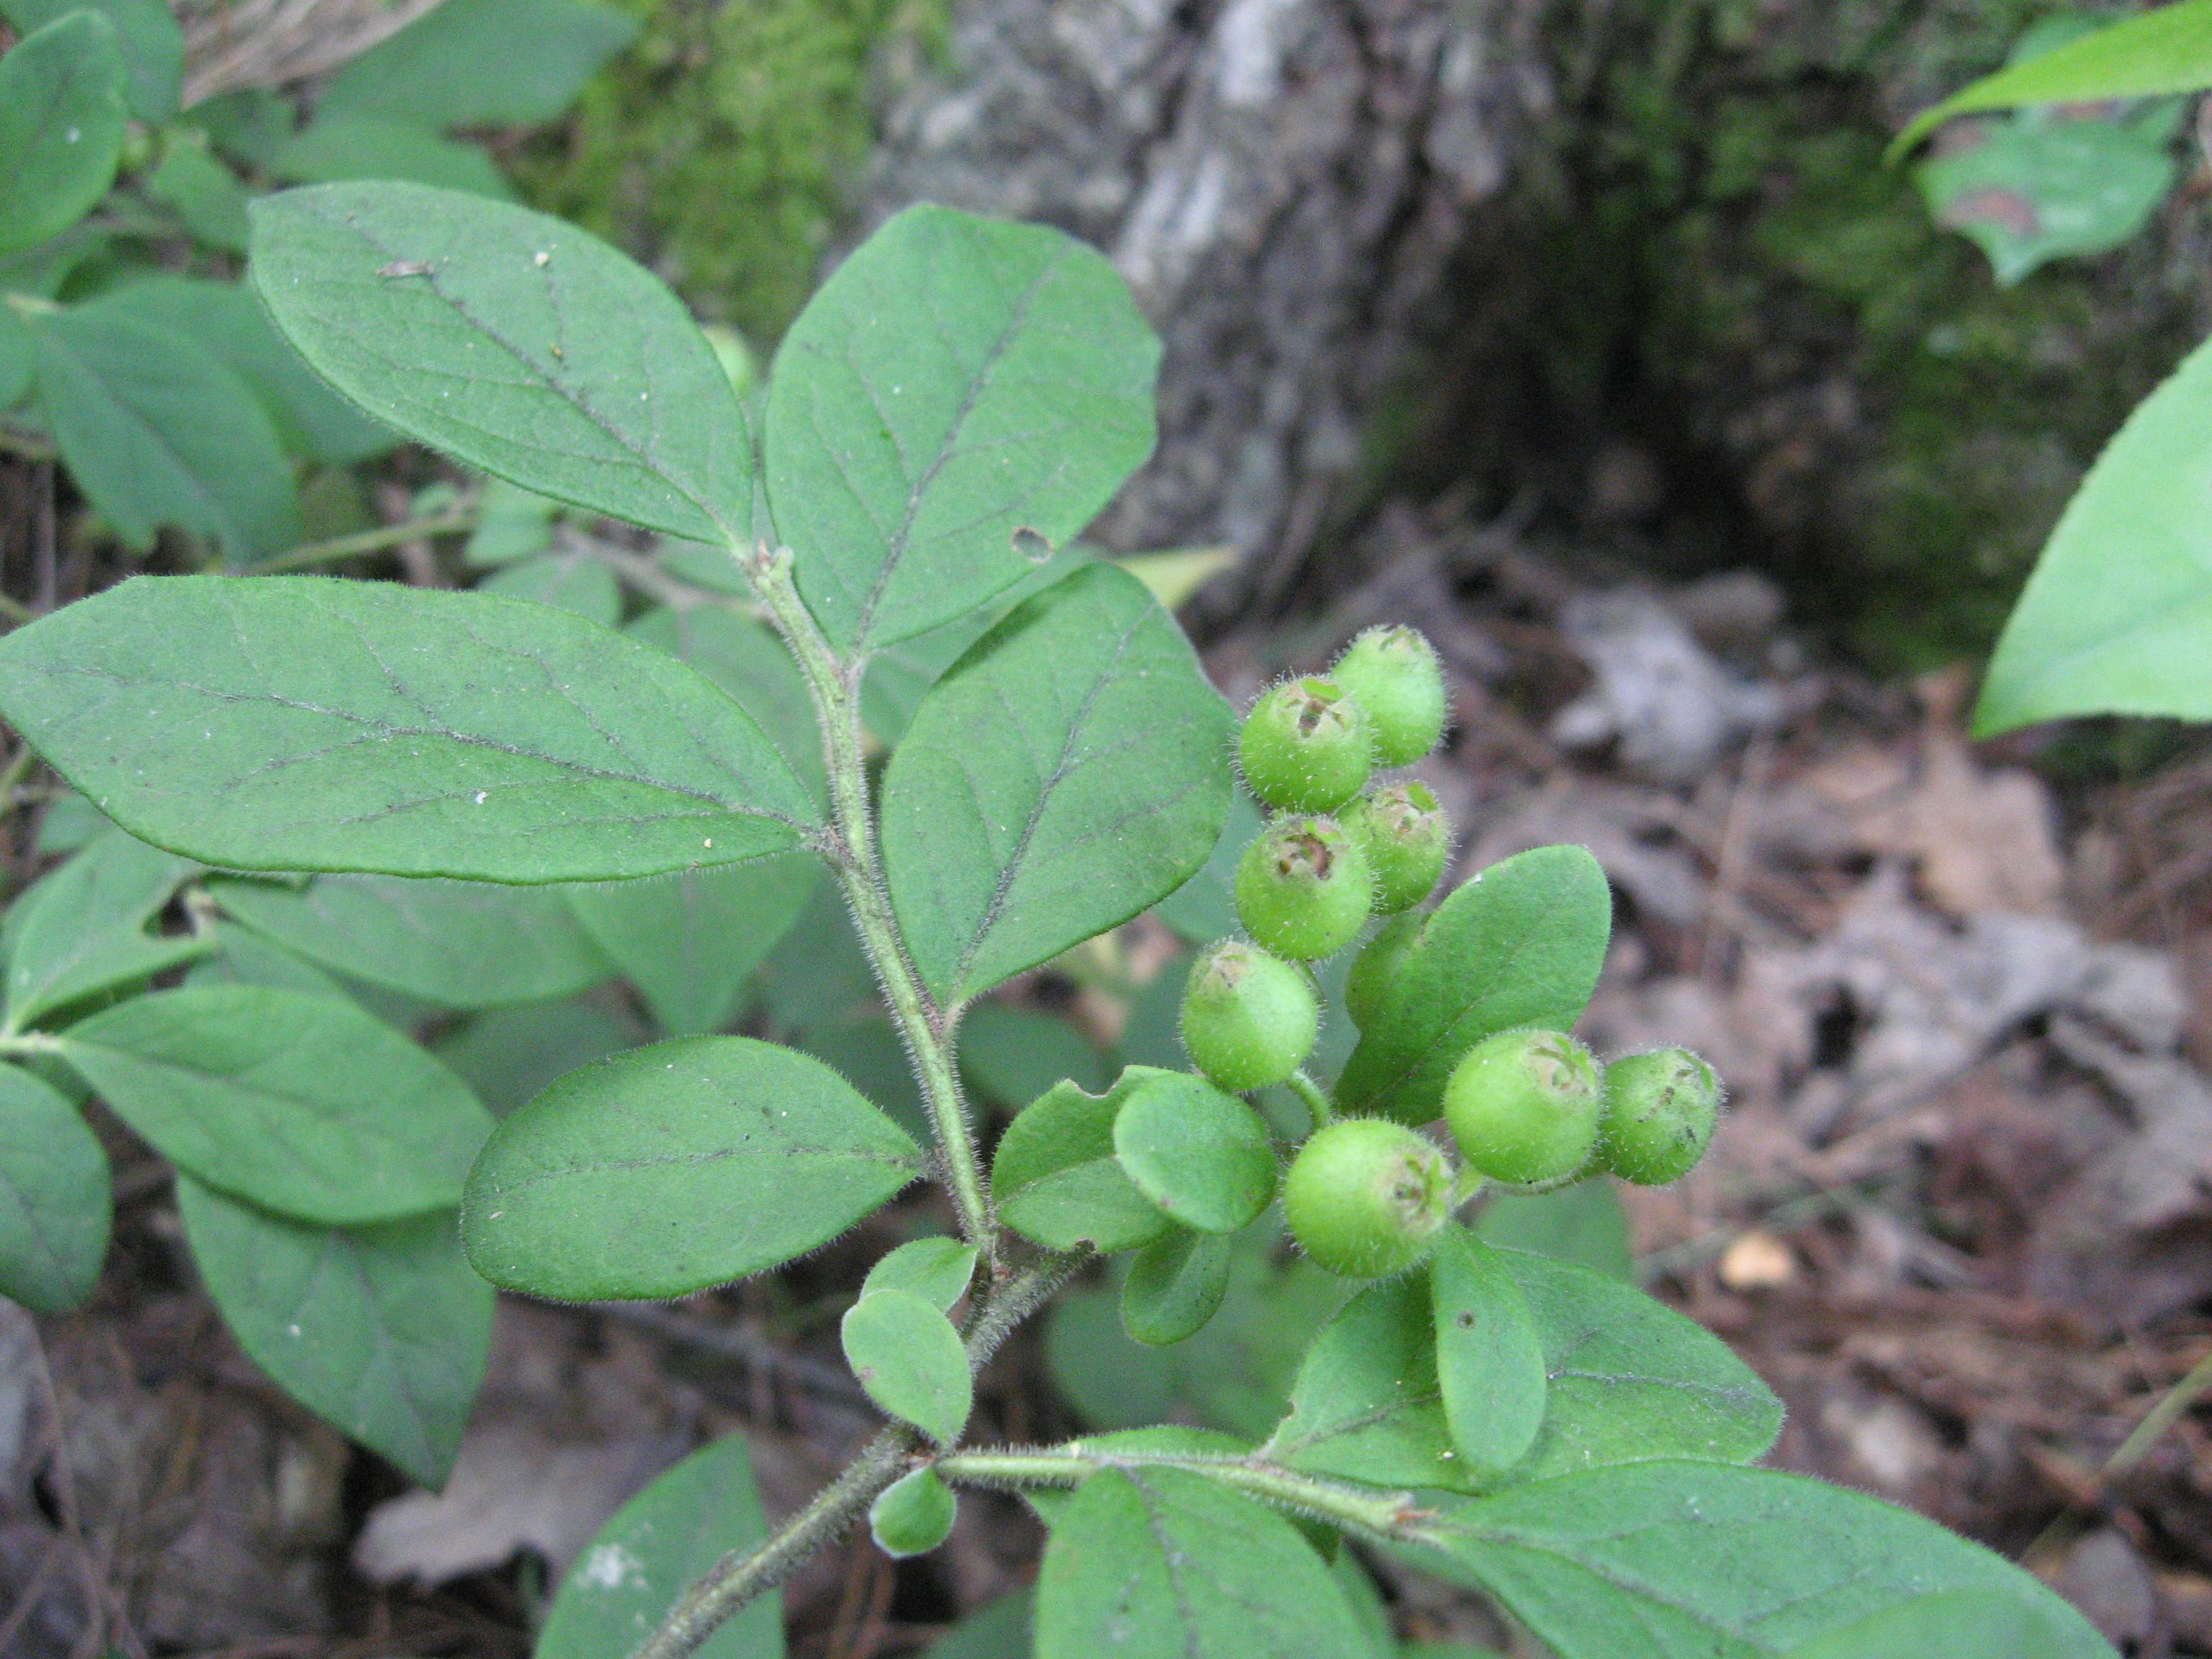 Image of hairy blueberry